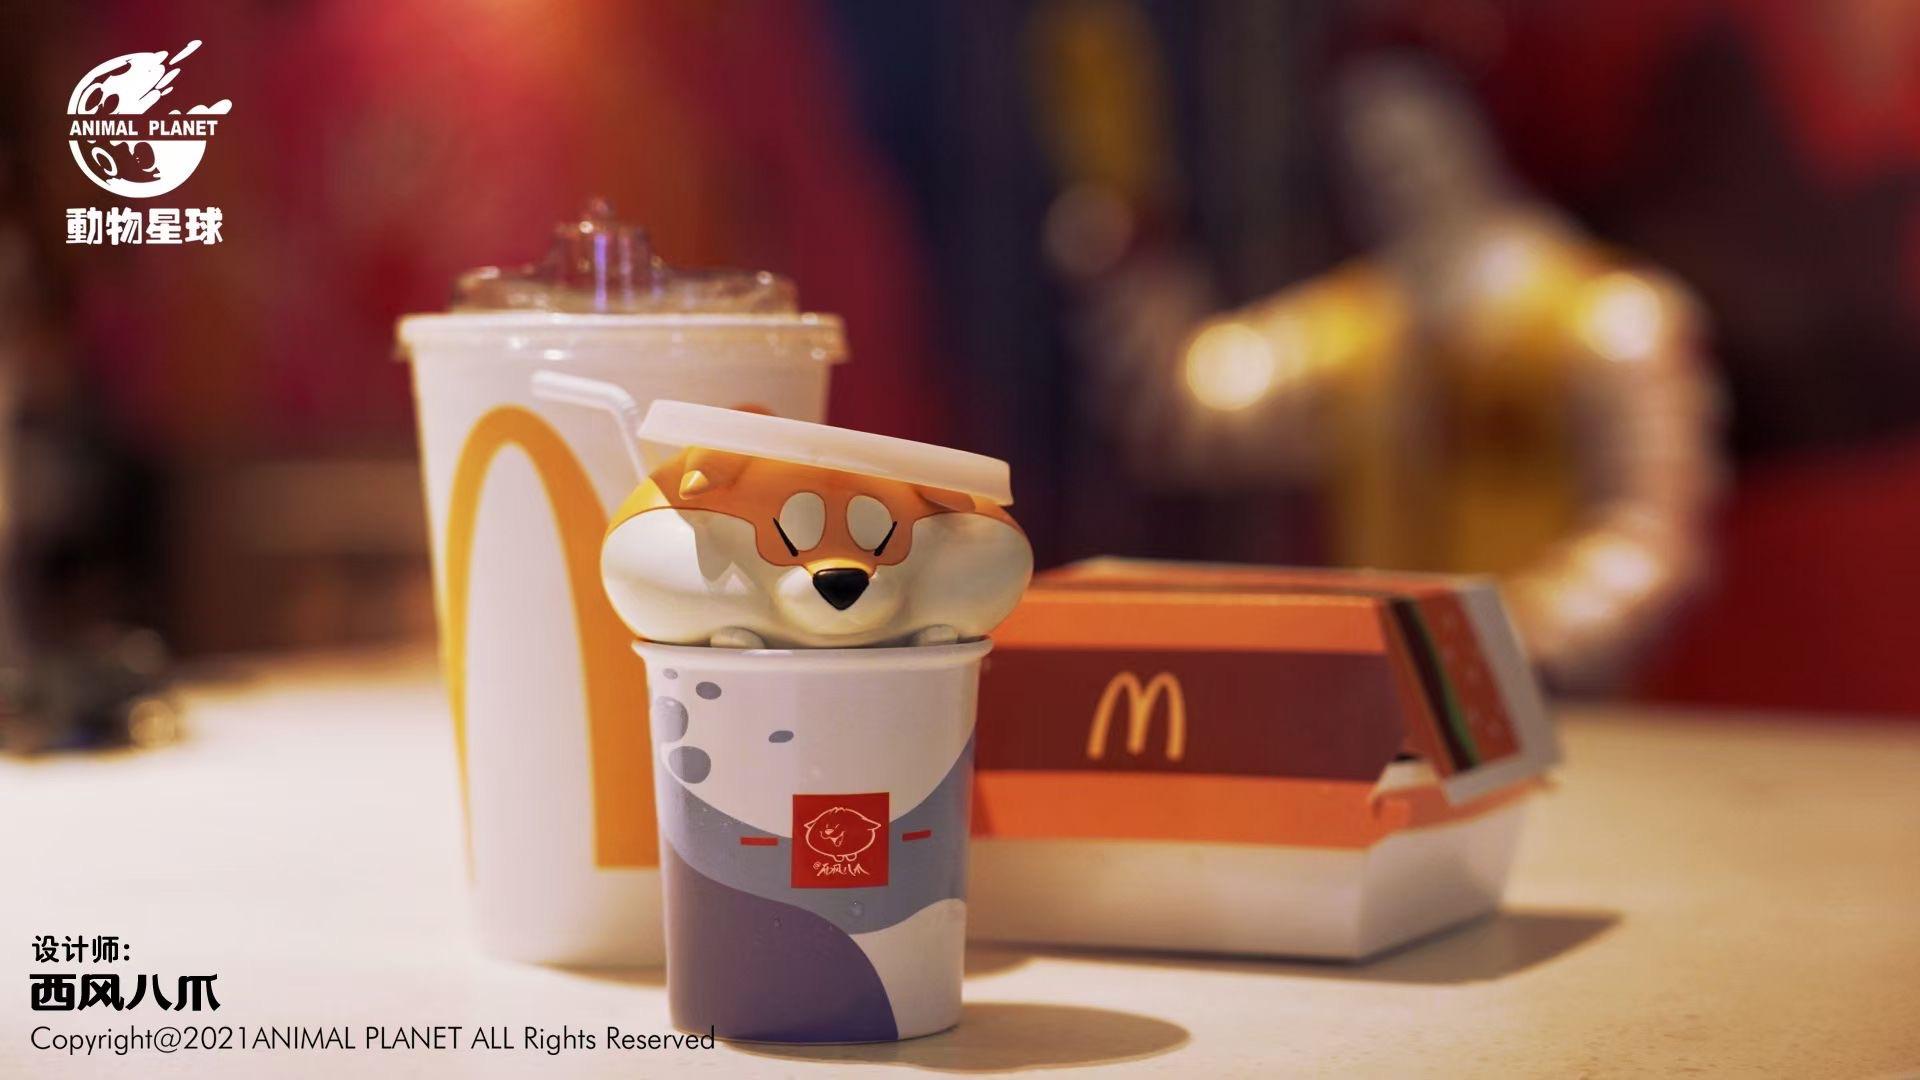 C Shiba x McDonald ชิบะแม็ค Animal Planet (มัดจำ)